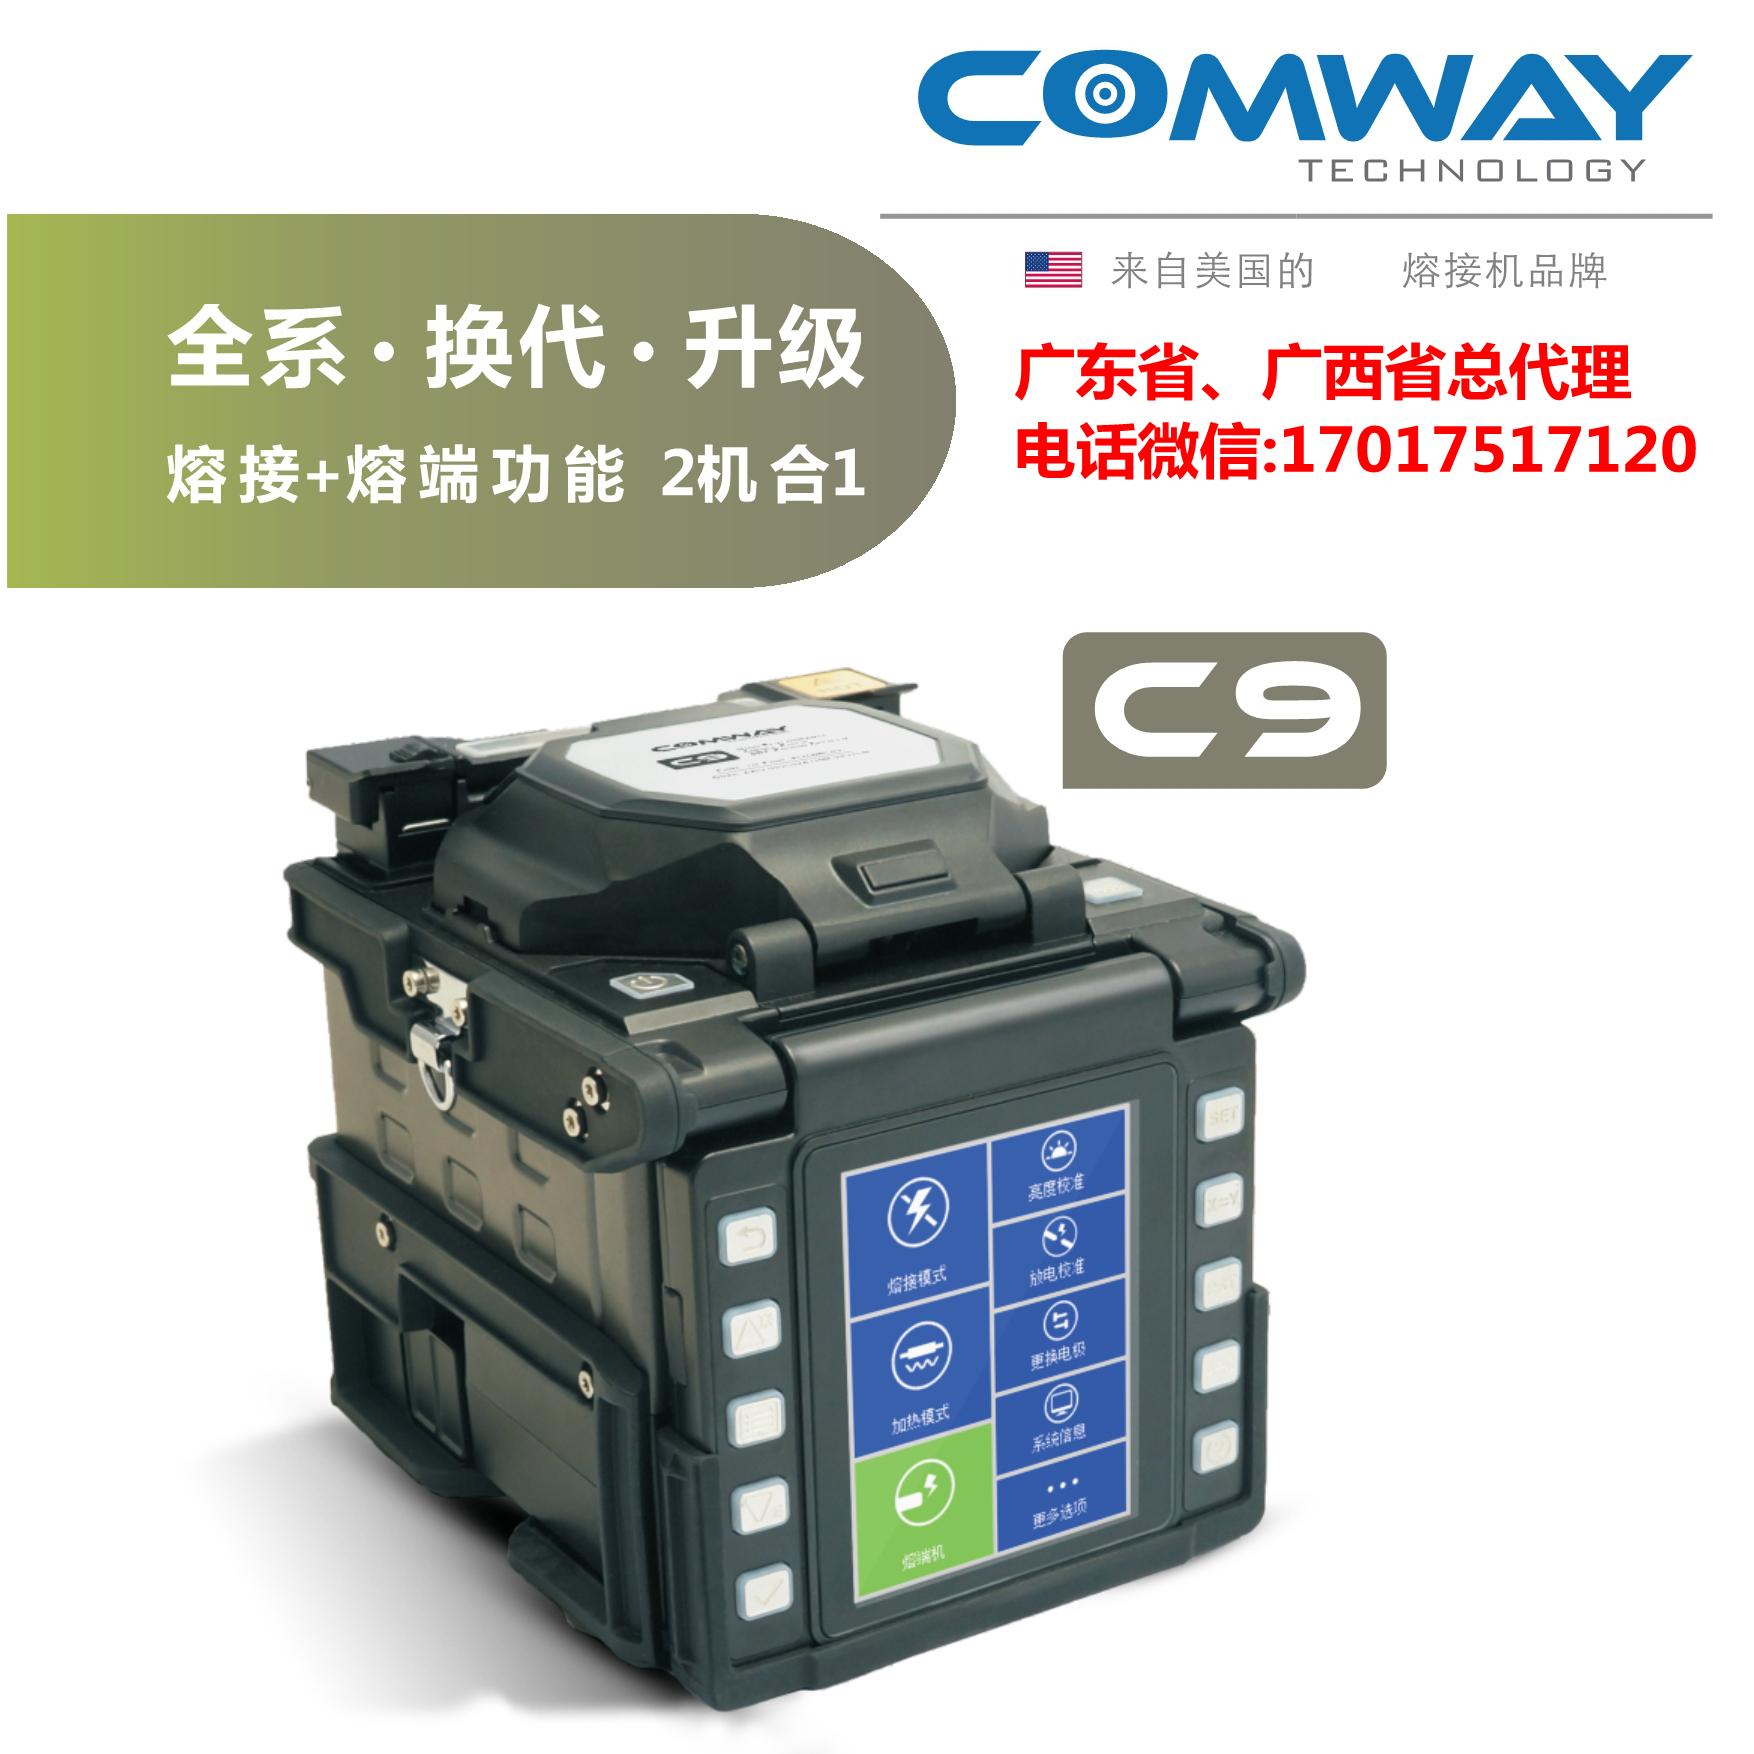 COMWAY C9/美国康未 C9 6马达干线光纤熔接机